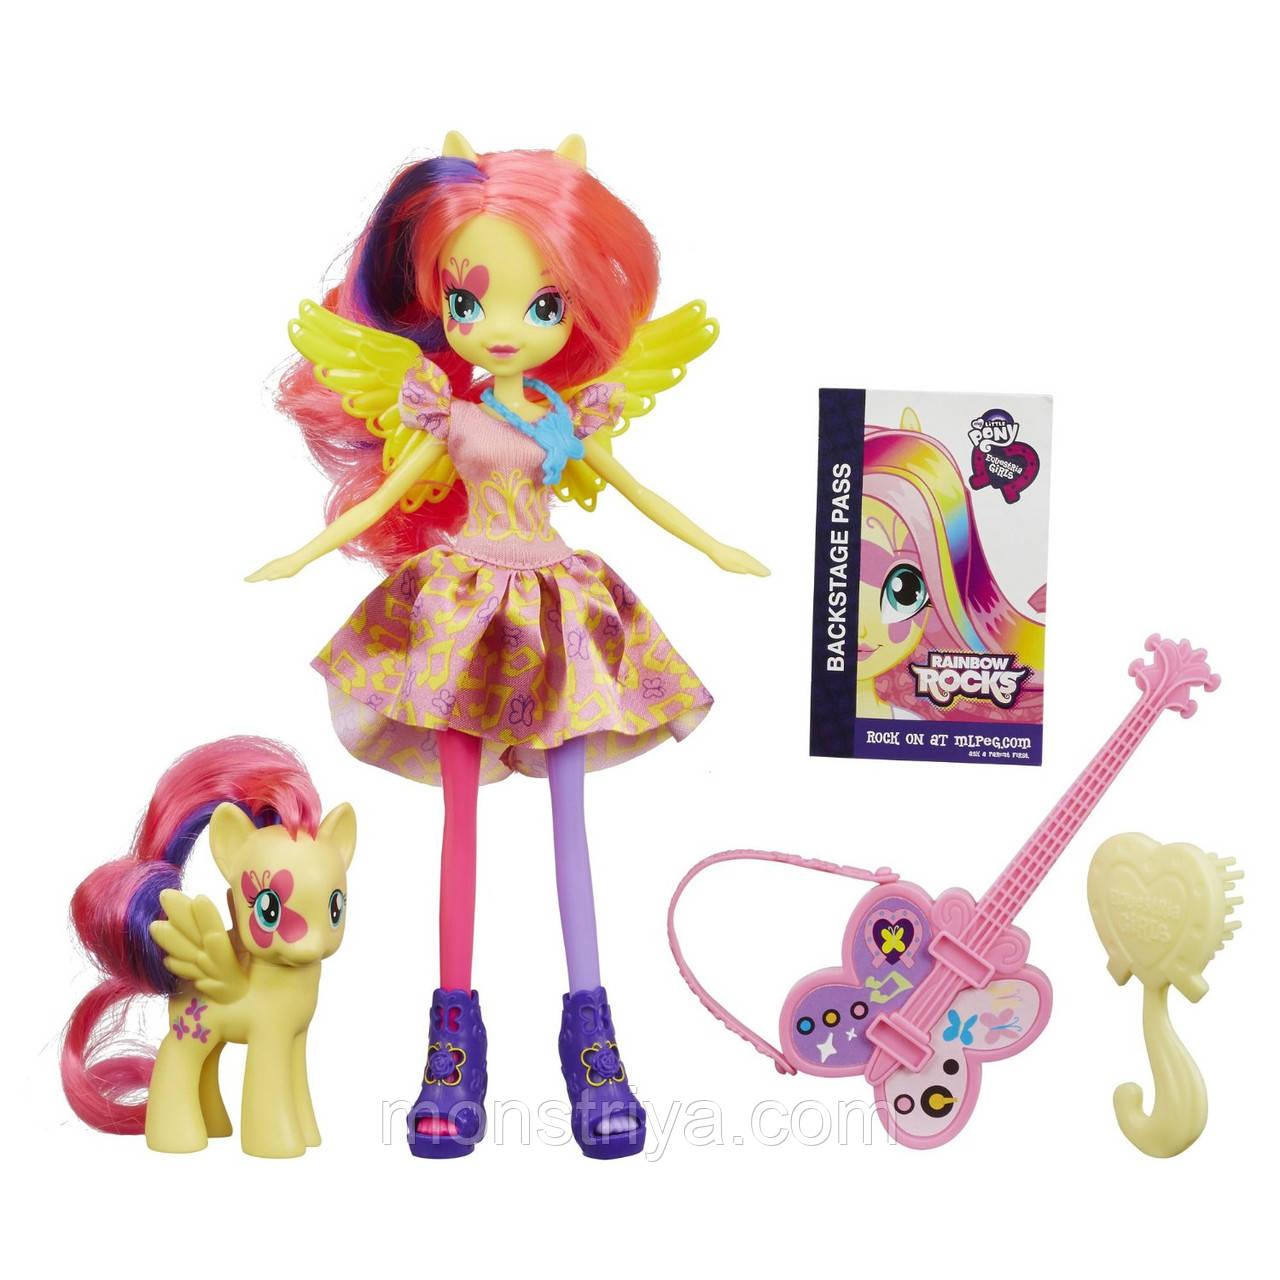 Набор кукла Флатершай Рок-Звезда с пони и гитарой My Little Pony Equestria Girls Fluttershy Doll and Pony Киев